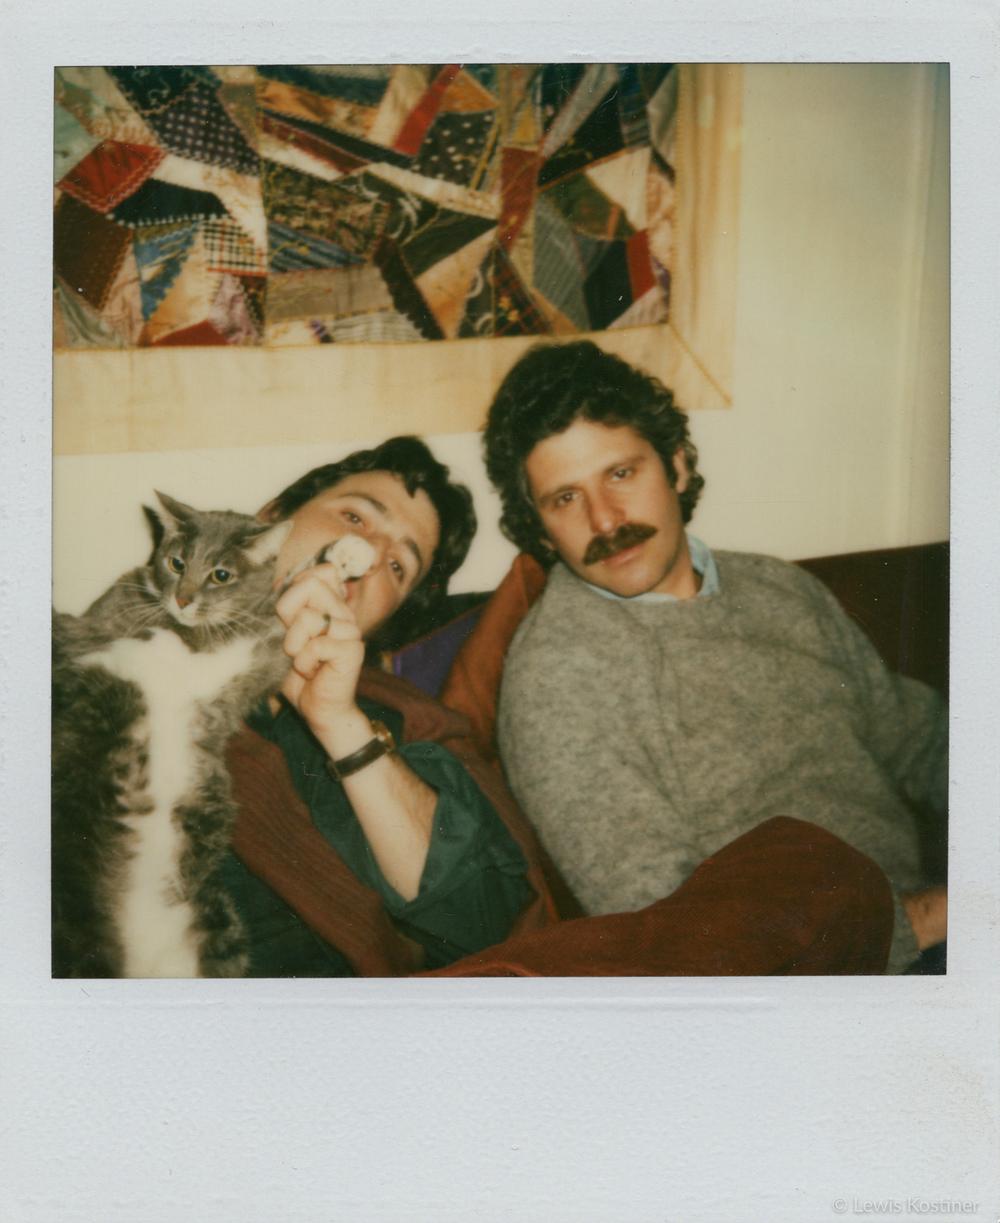 Michael Abramson & Lewis Kostiner, Chicago, 1980's